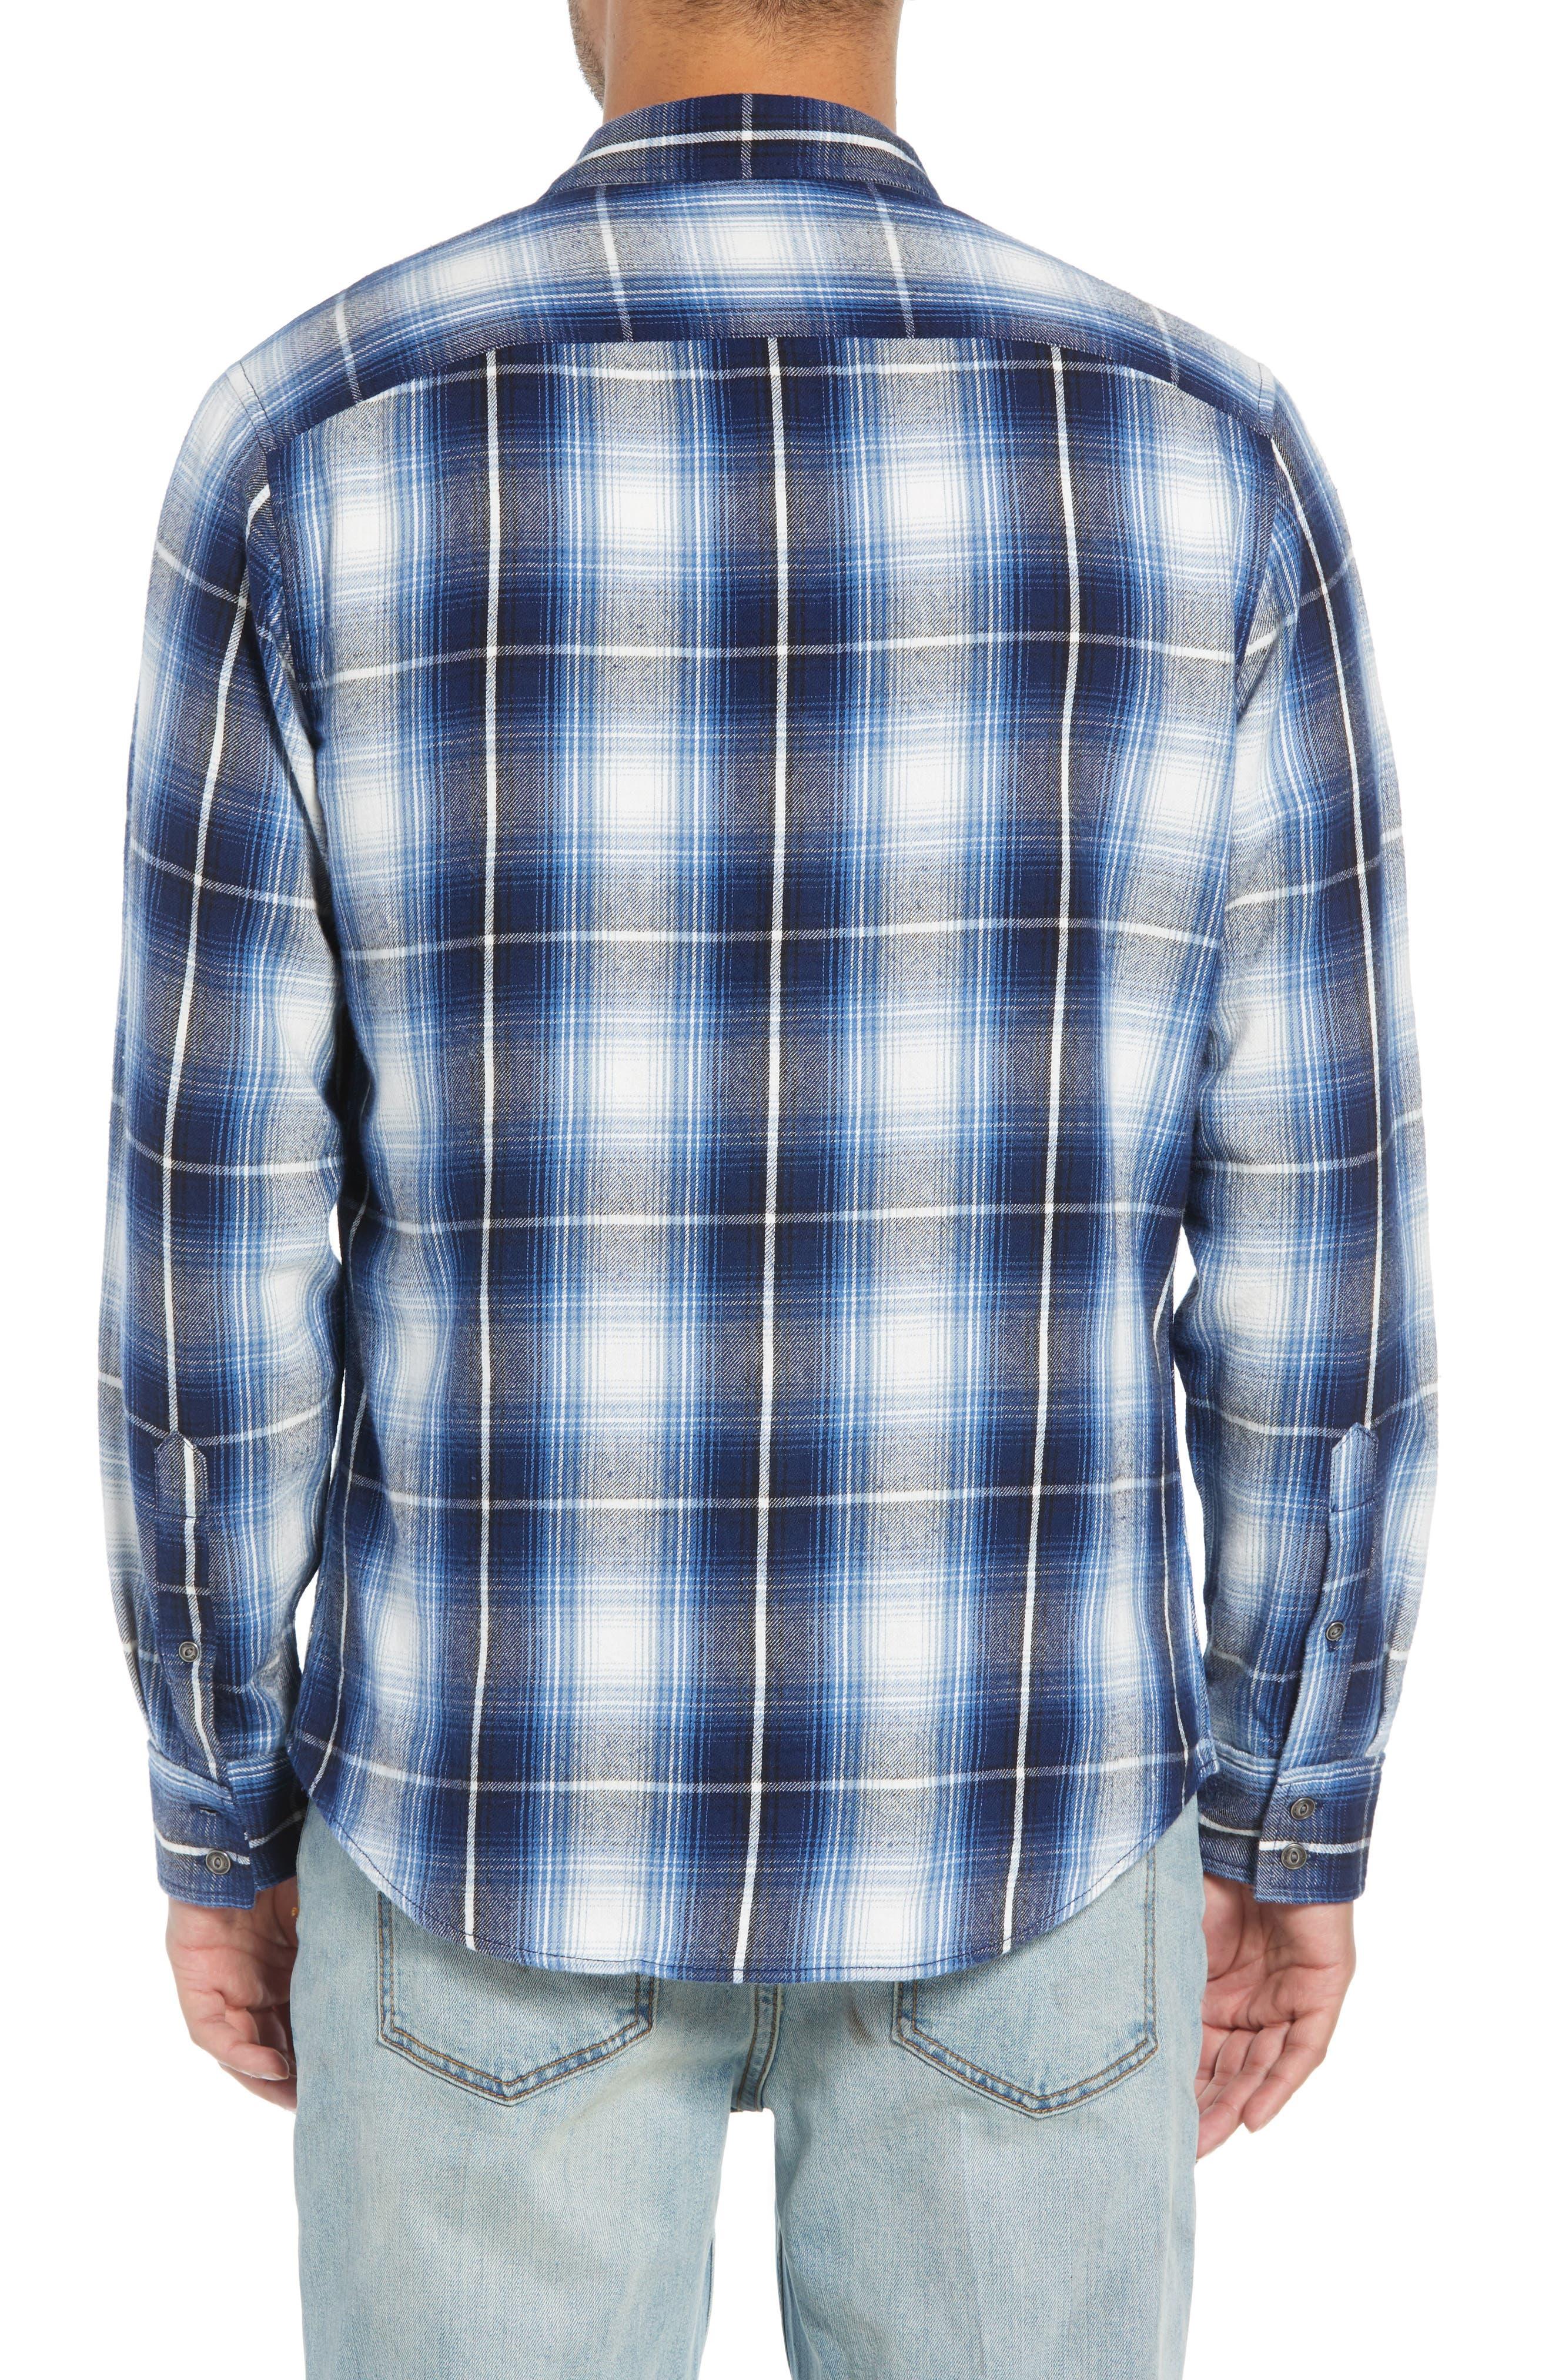 Slim Fit Plaid Flap Pocket Sport Shirt,                             Alternate thumbnail 2, color,                             BLUE CASPIA RIVER PLAID